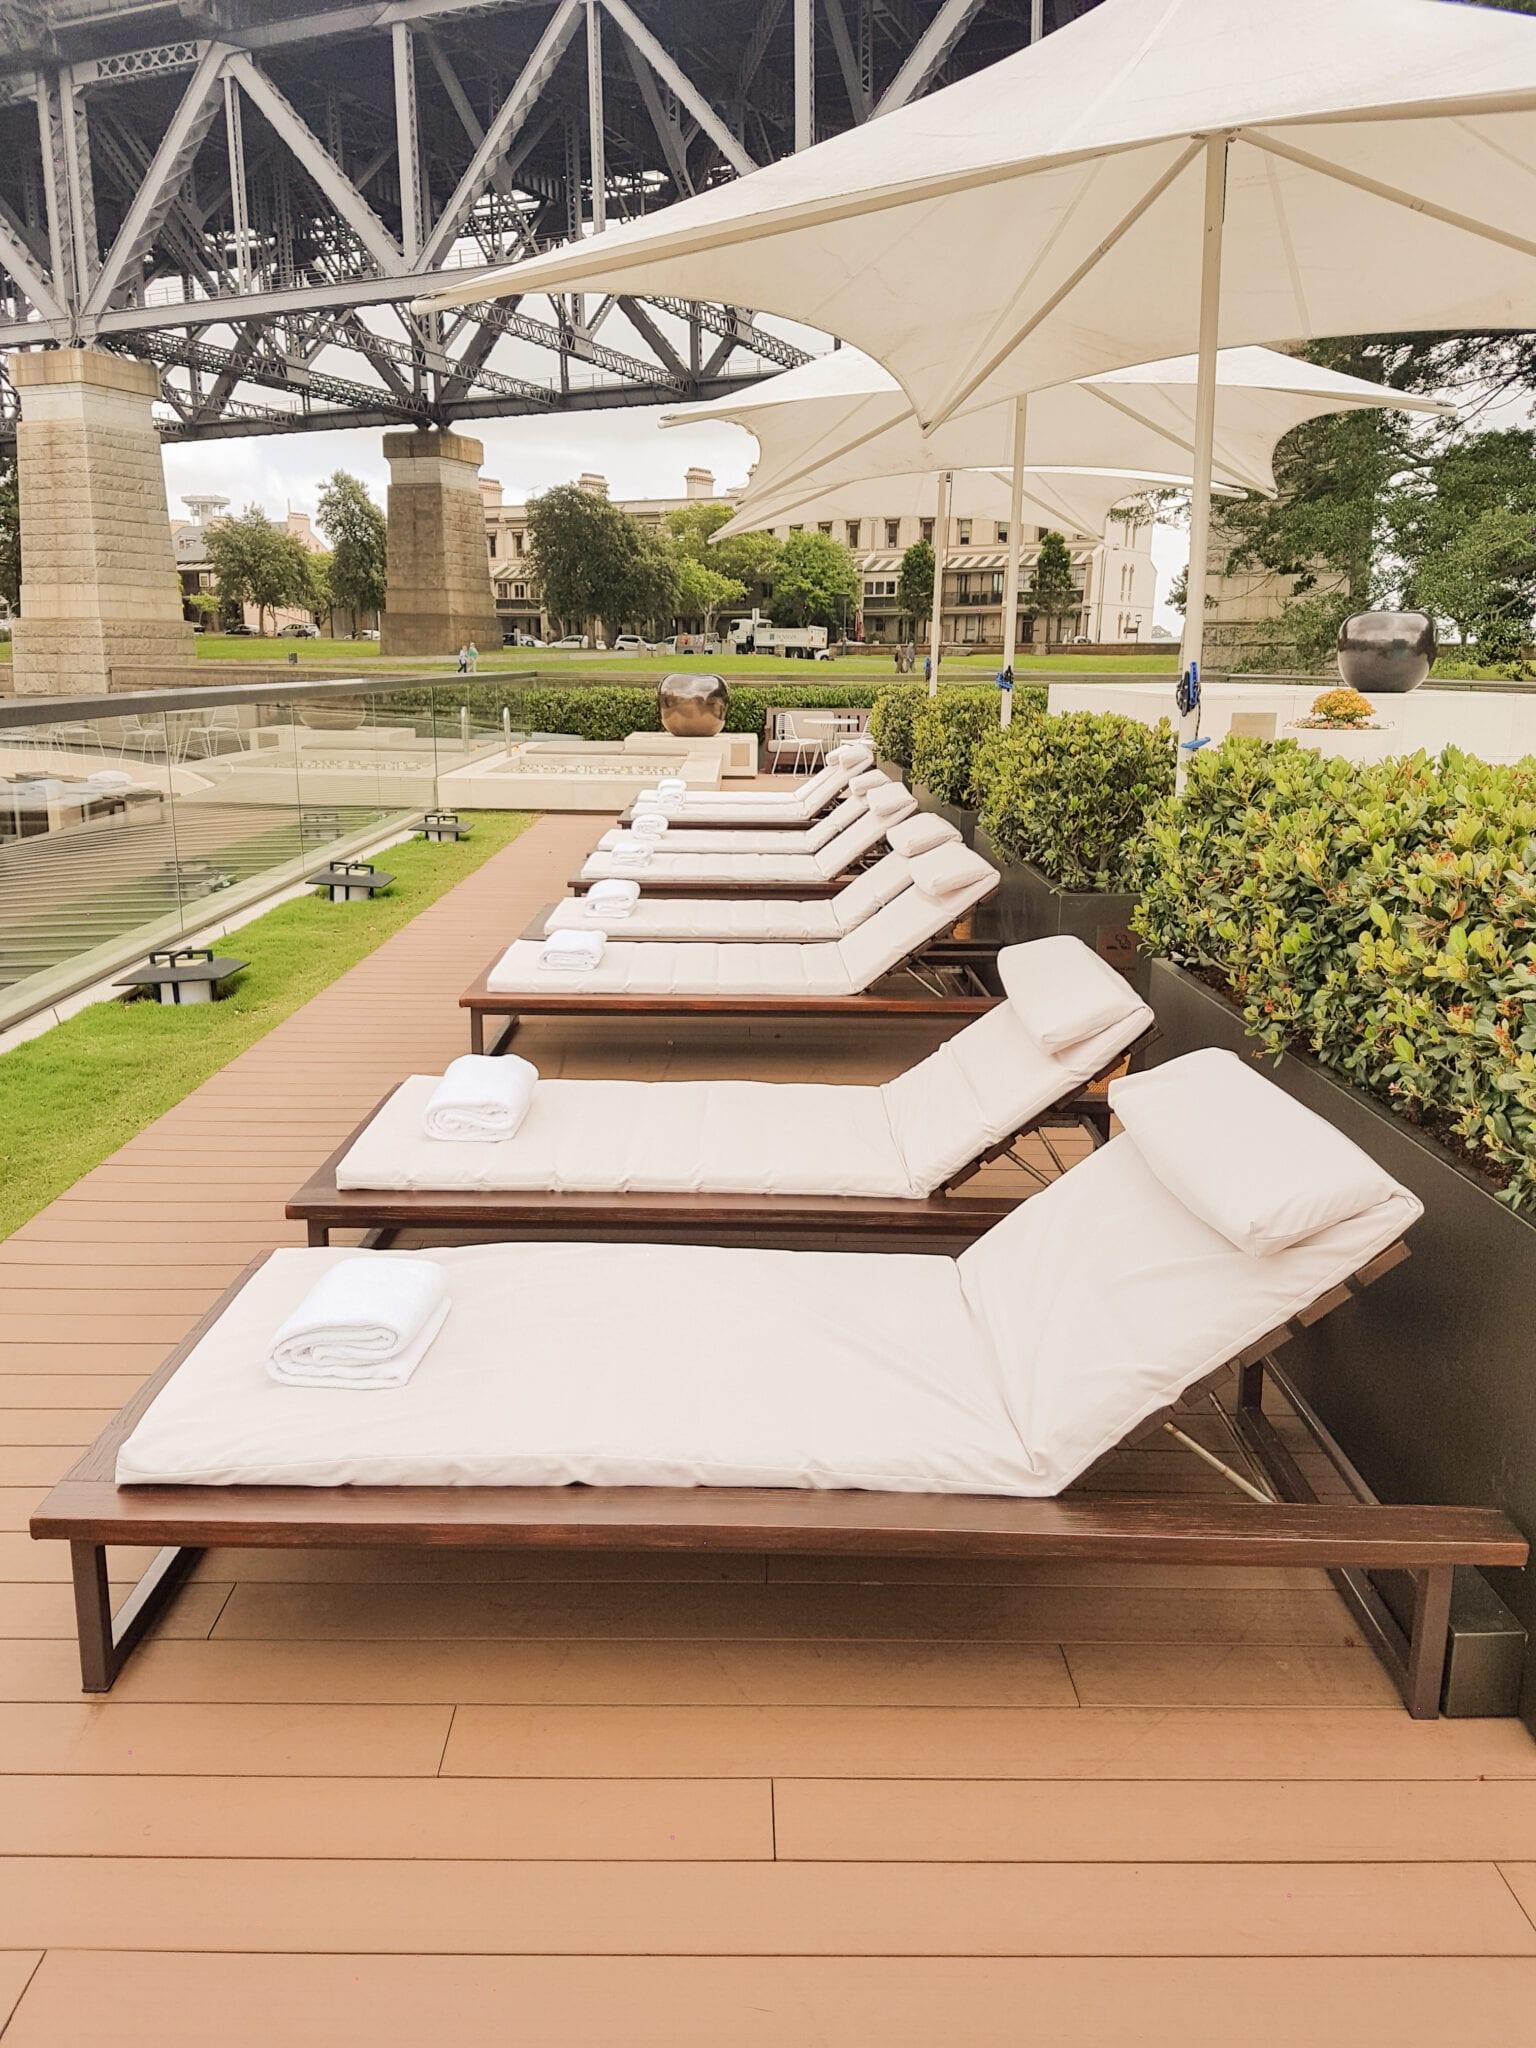 PH SYD Opera deluxe 103 - REVIEW - Park Hyatt Sydney : Opera Deluxe Room